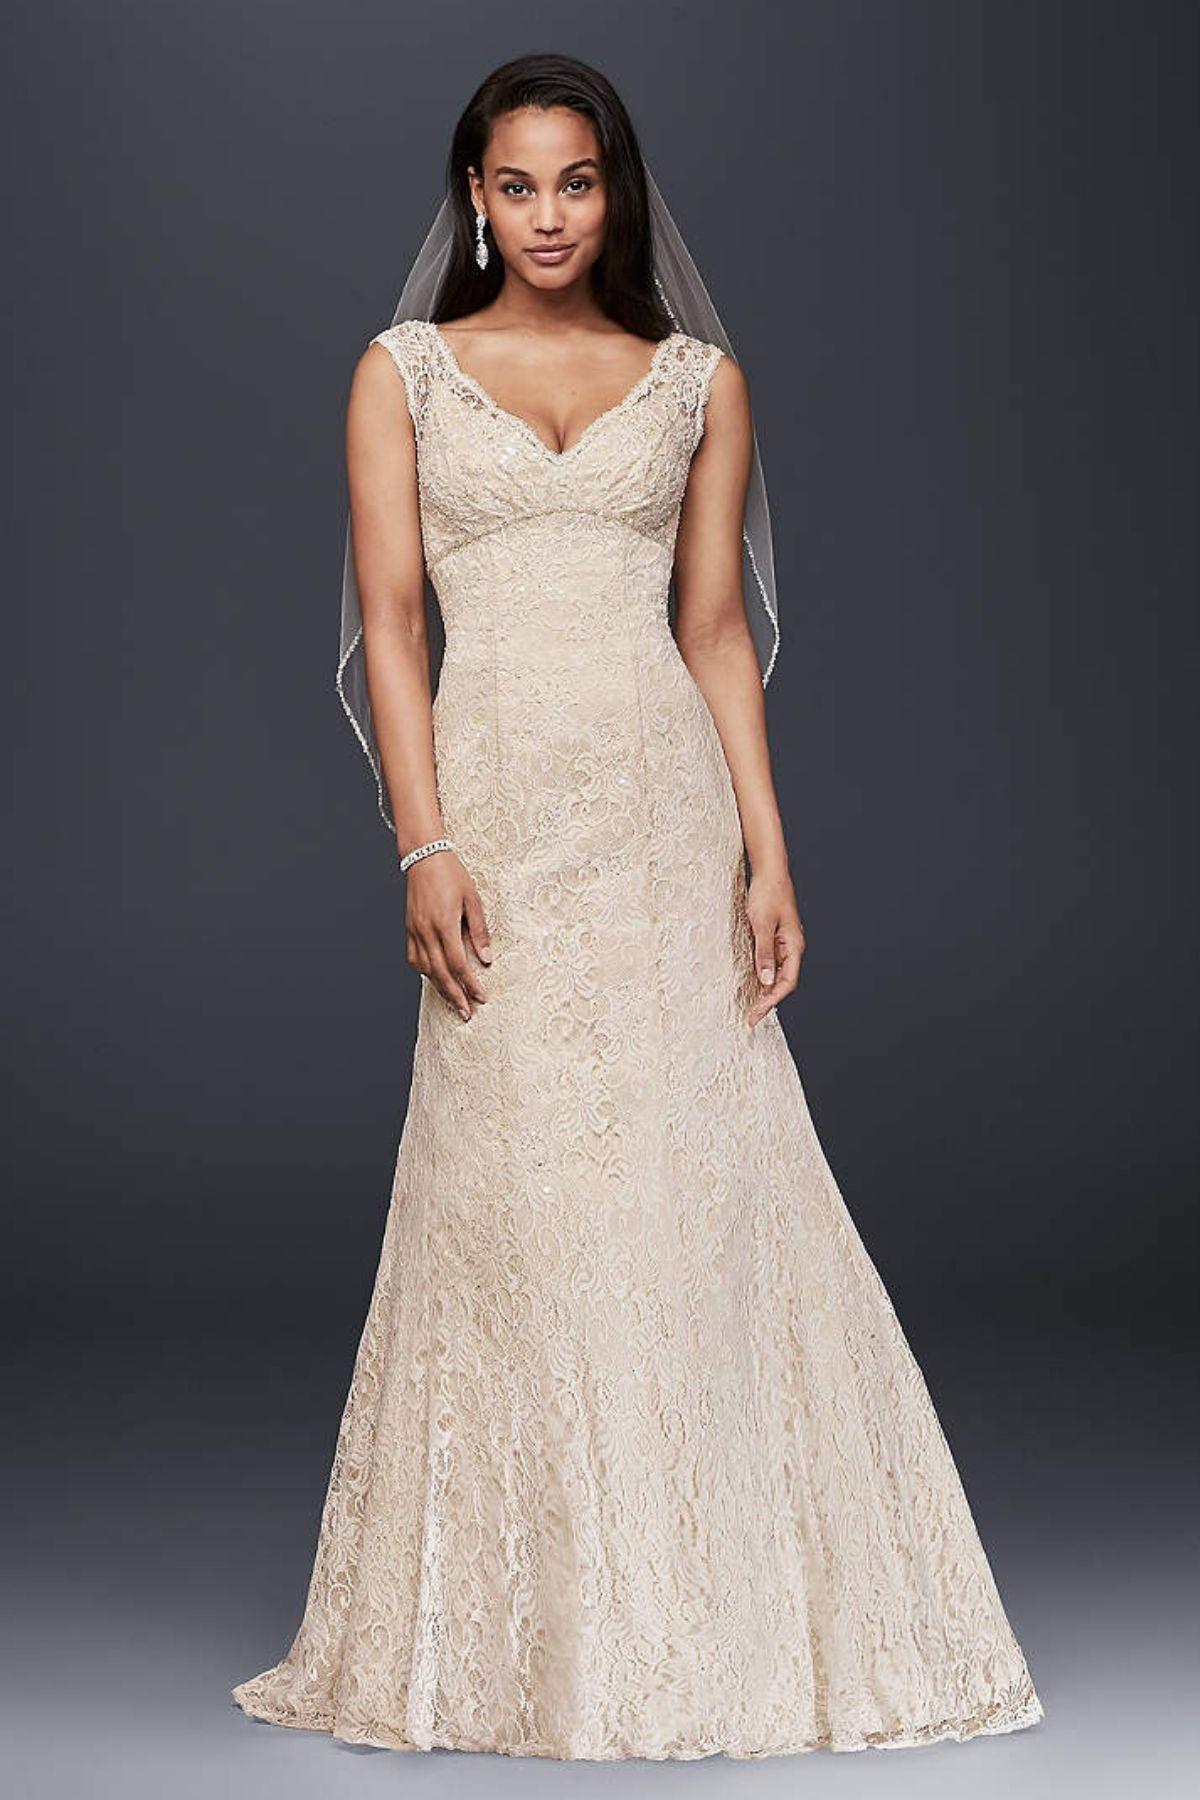 9. Cap Sleeve Lace Over Satin Wedding Dress